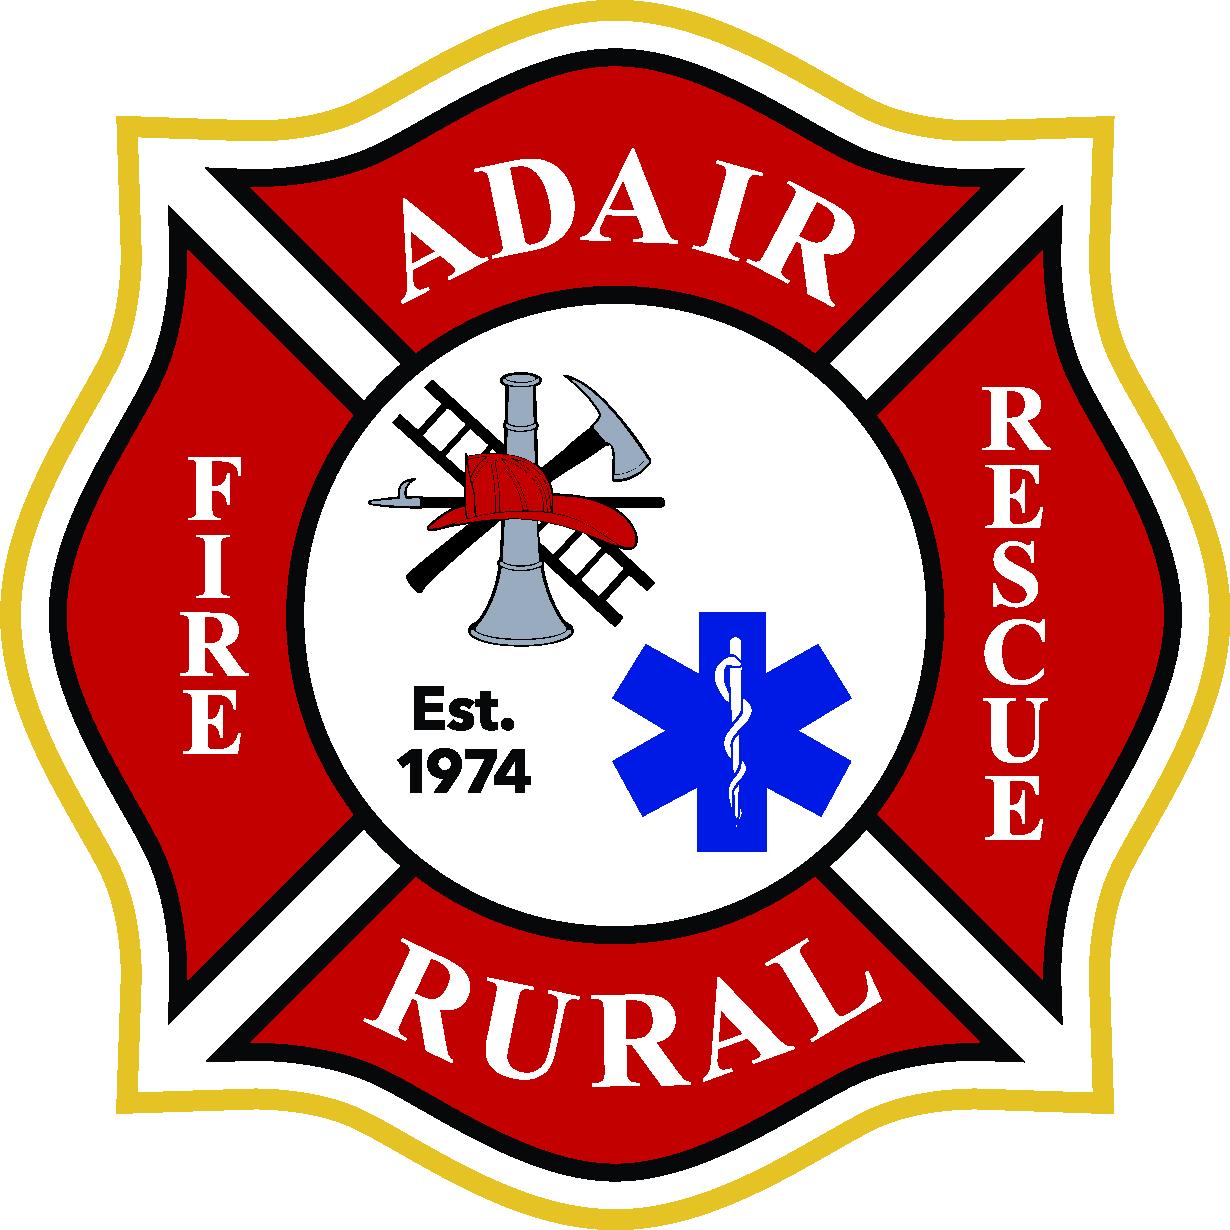 Adair Rural Fire & Rescue